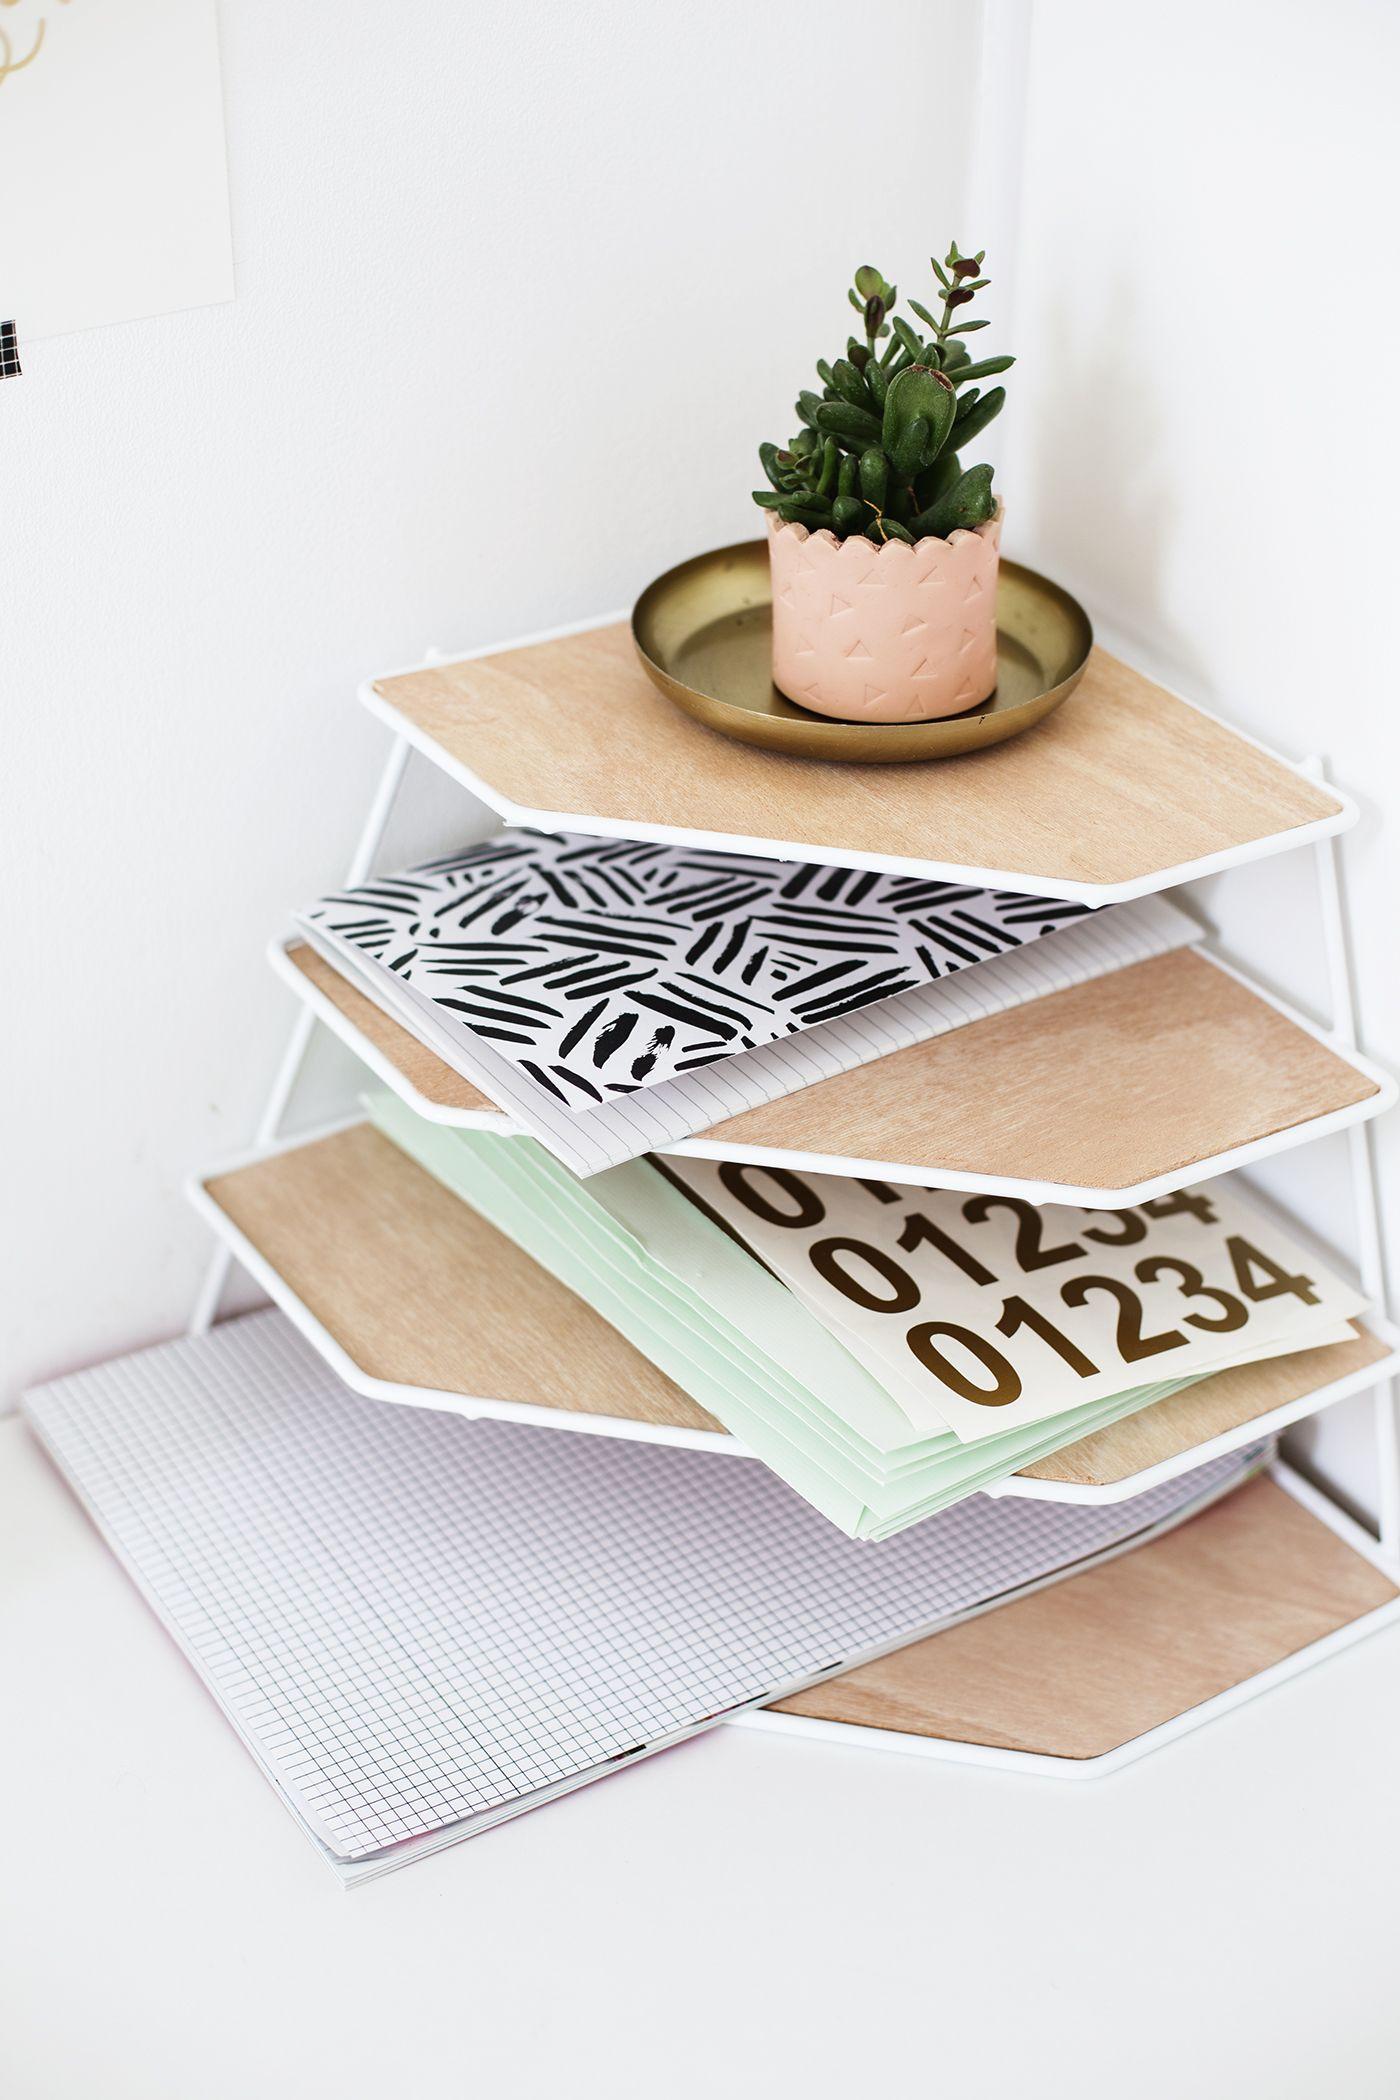 Workspace Goals Desk Organization Diy Work Space Decor Cubicle Decor